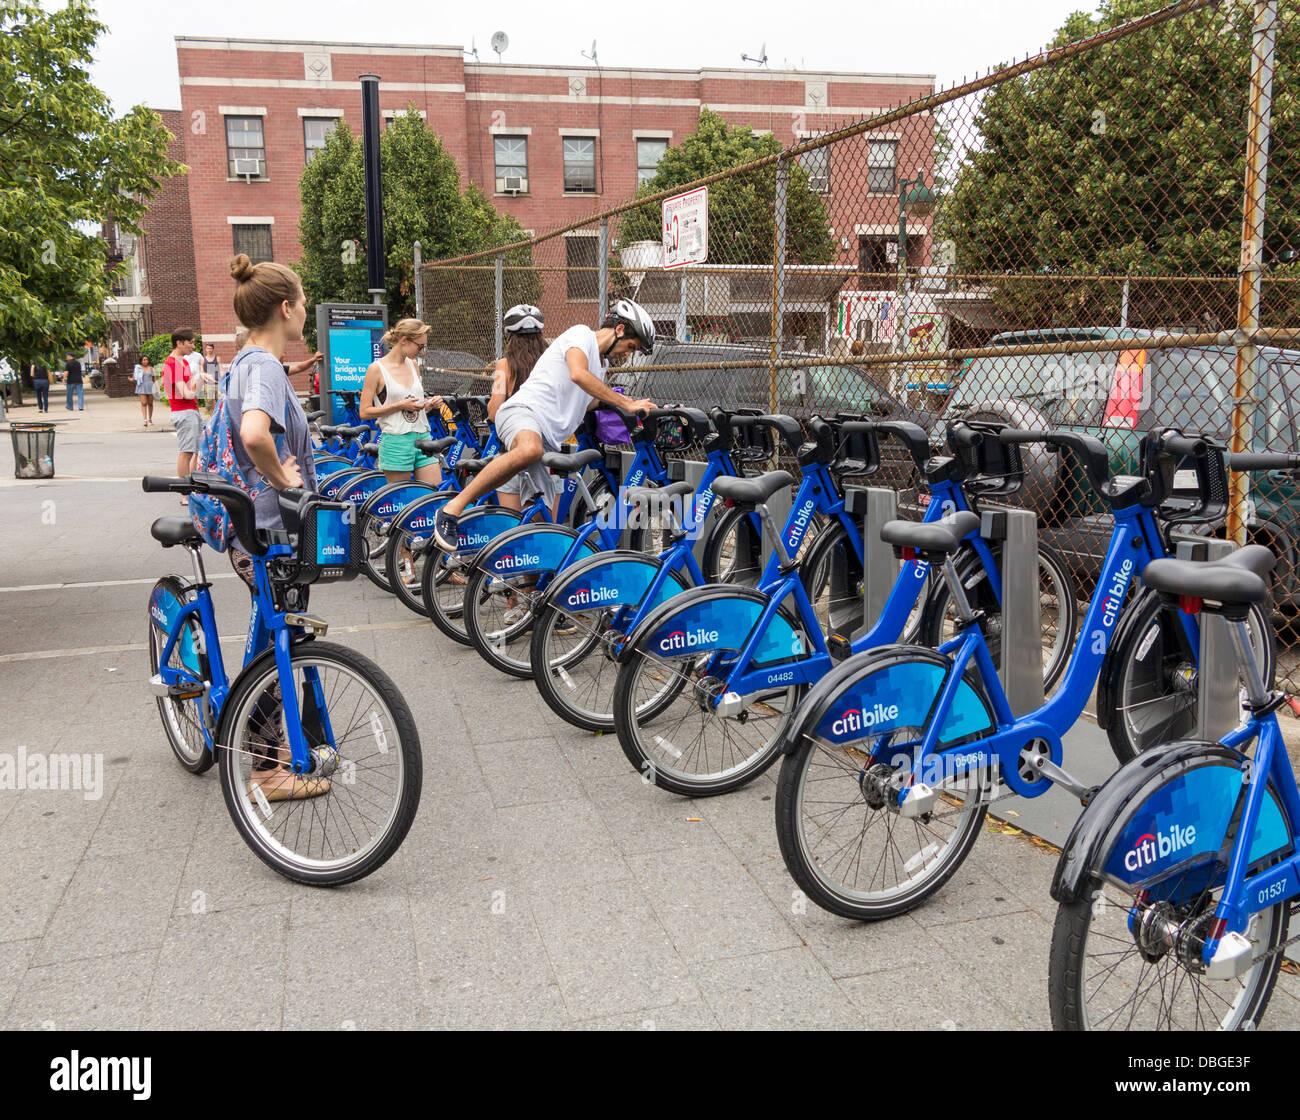 Citi Bikes in New York City - Stock Image